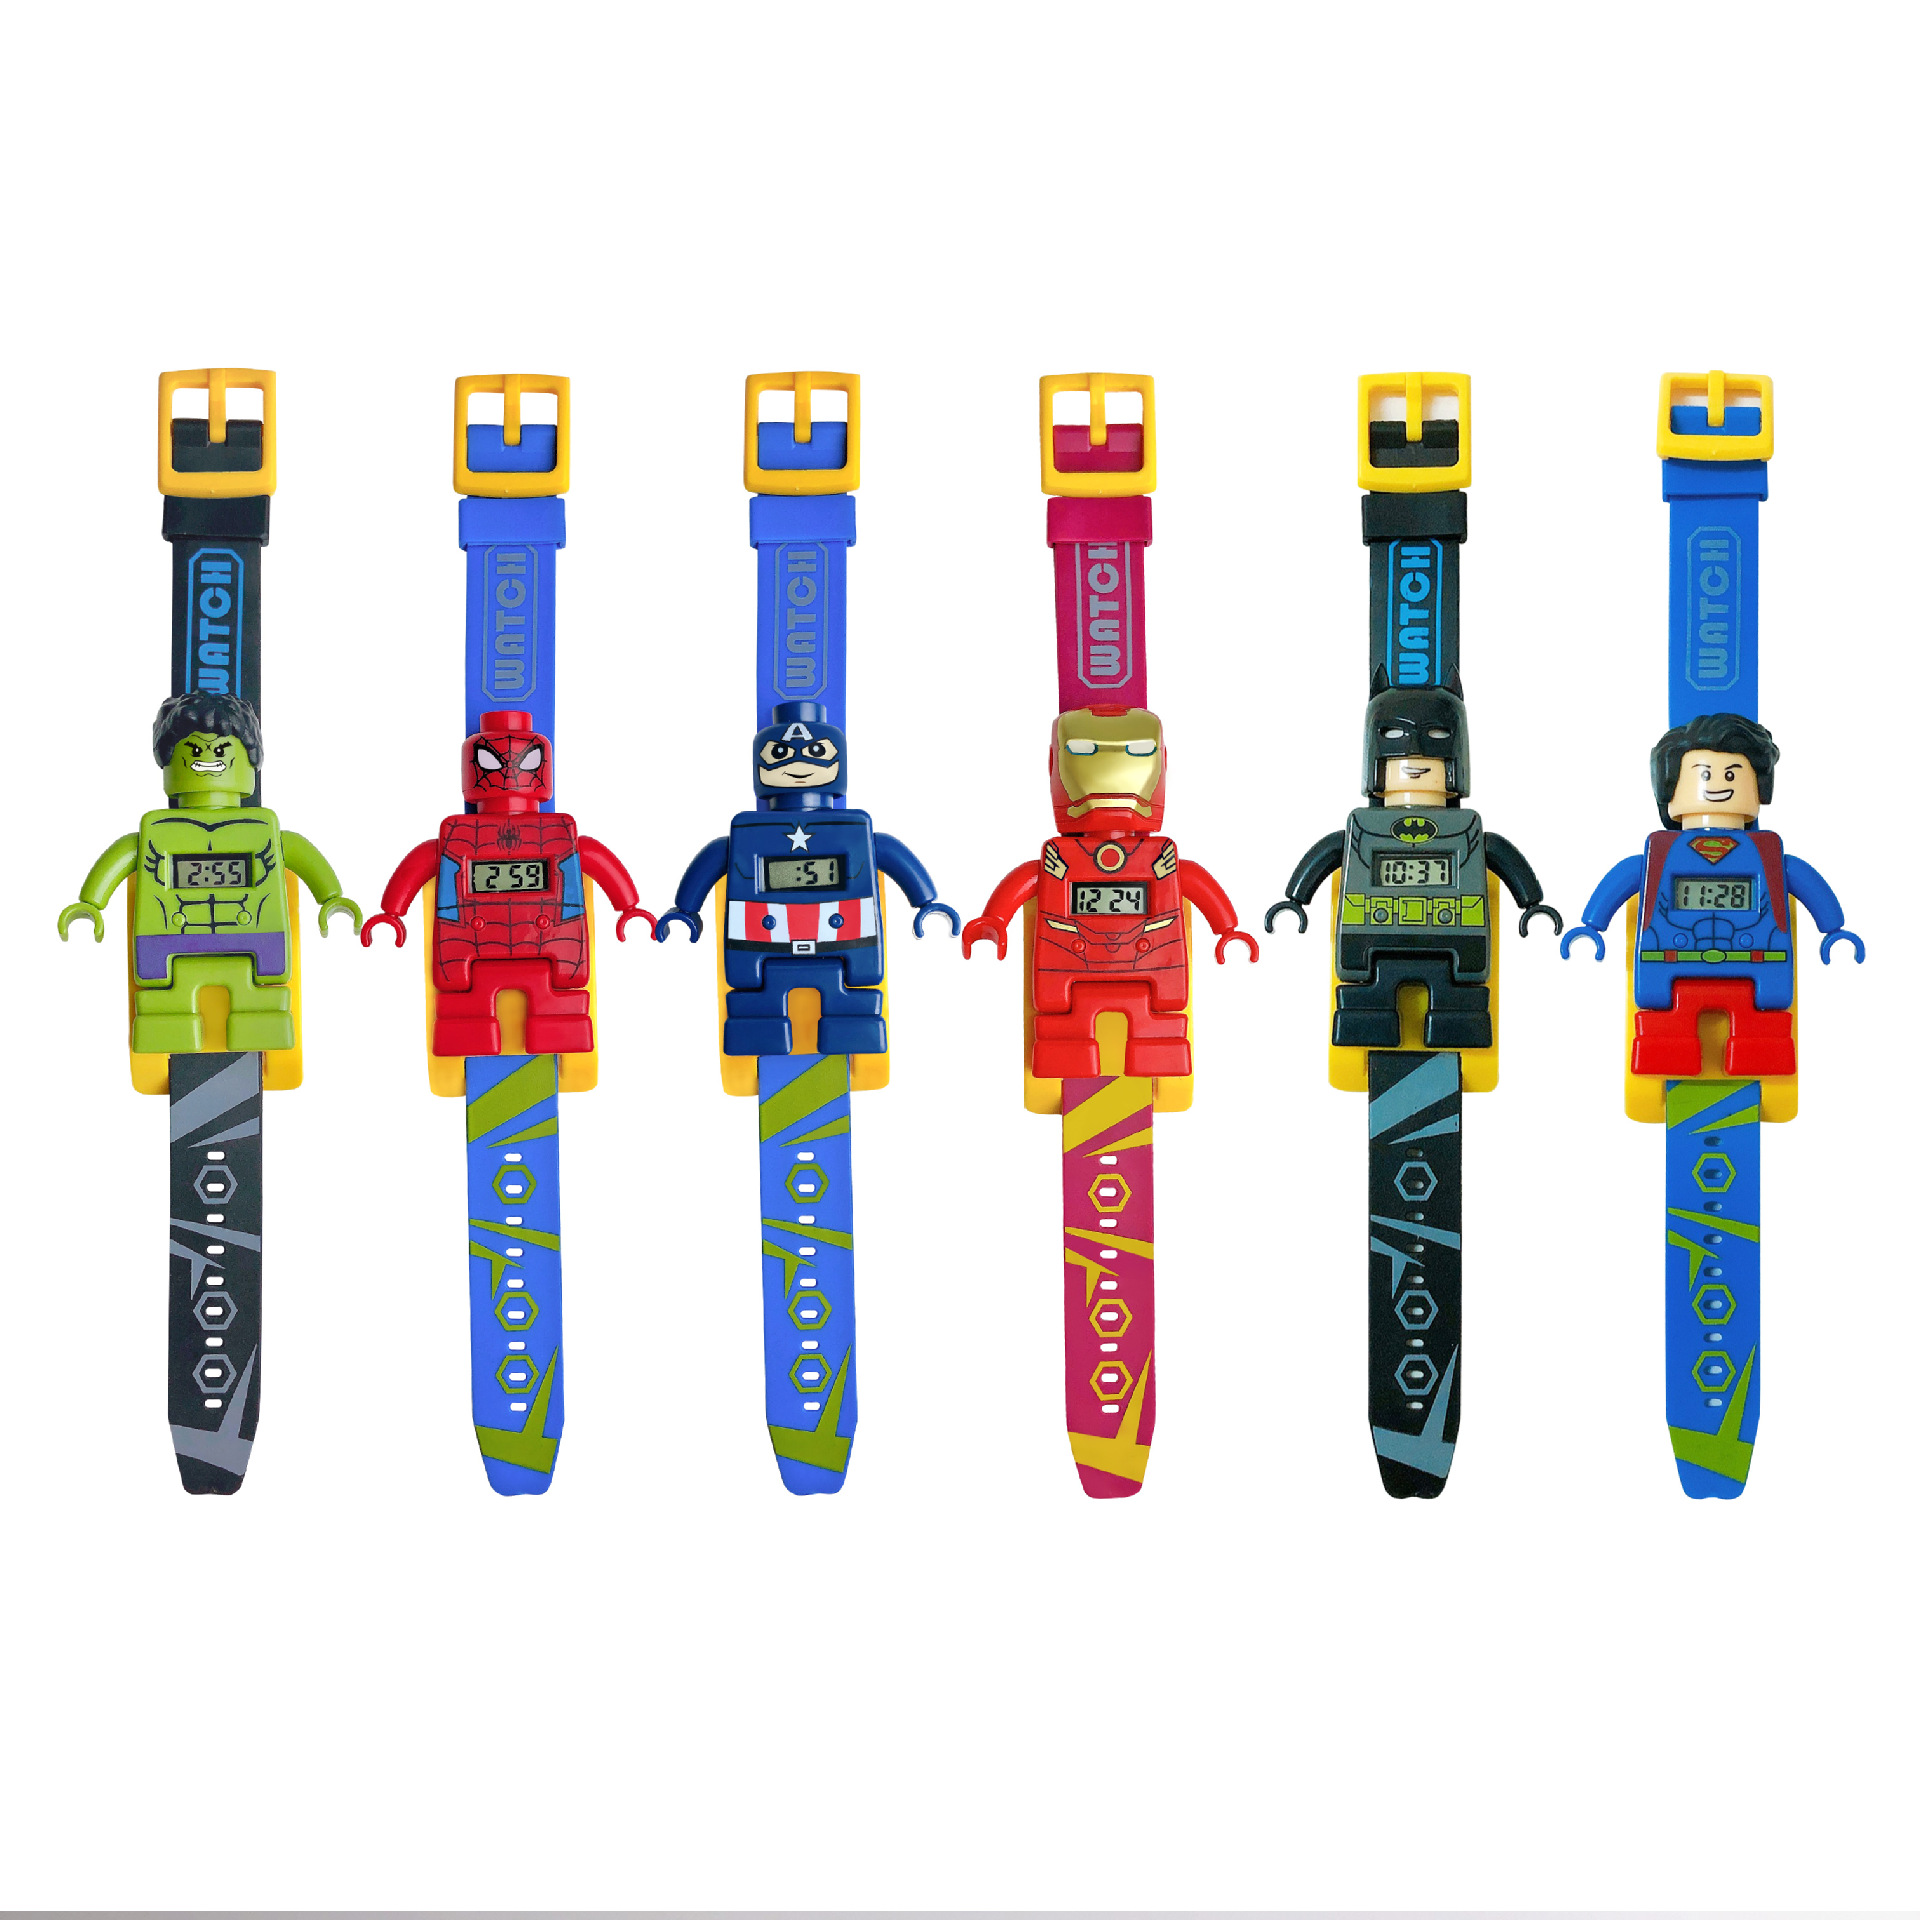 Spiderman Hulk Batman Captain Project Wristwatch Toy Electronic Watch Children Sports Cartoon Watches Kids Xmas Gifts #2685